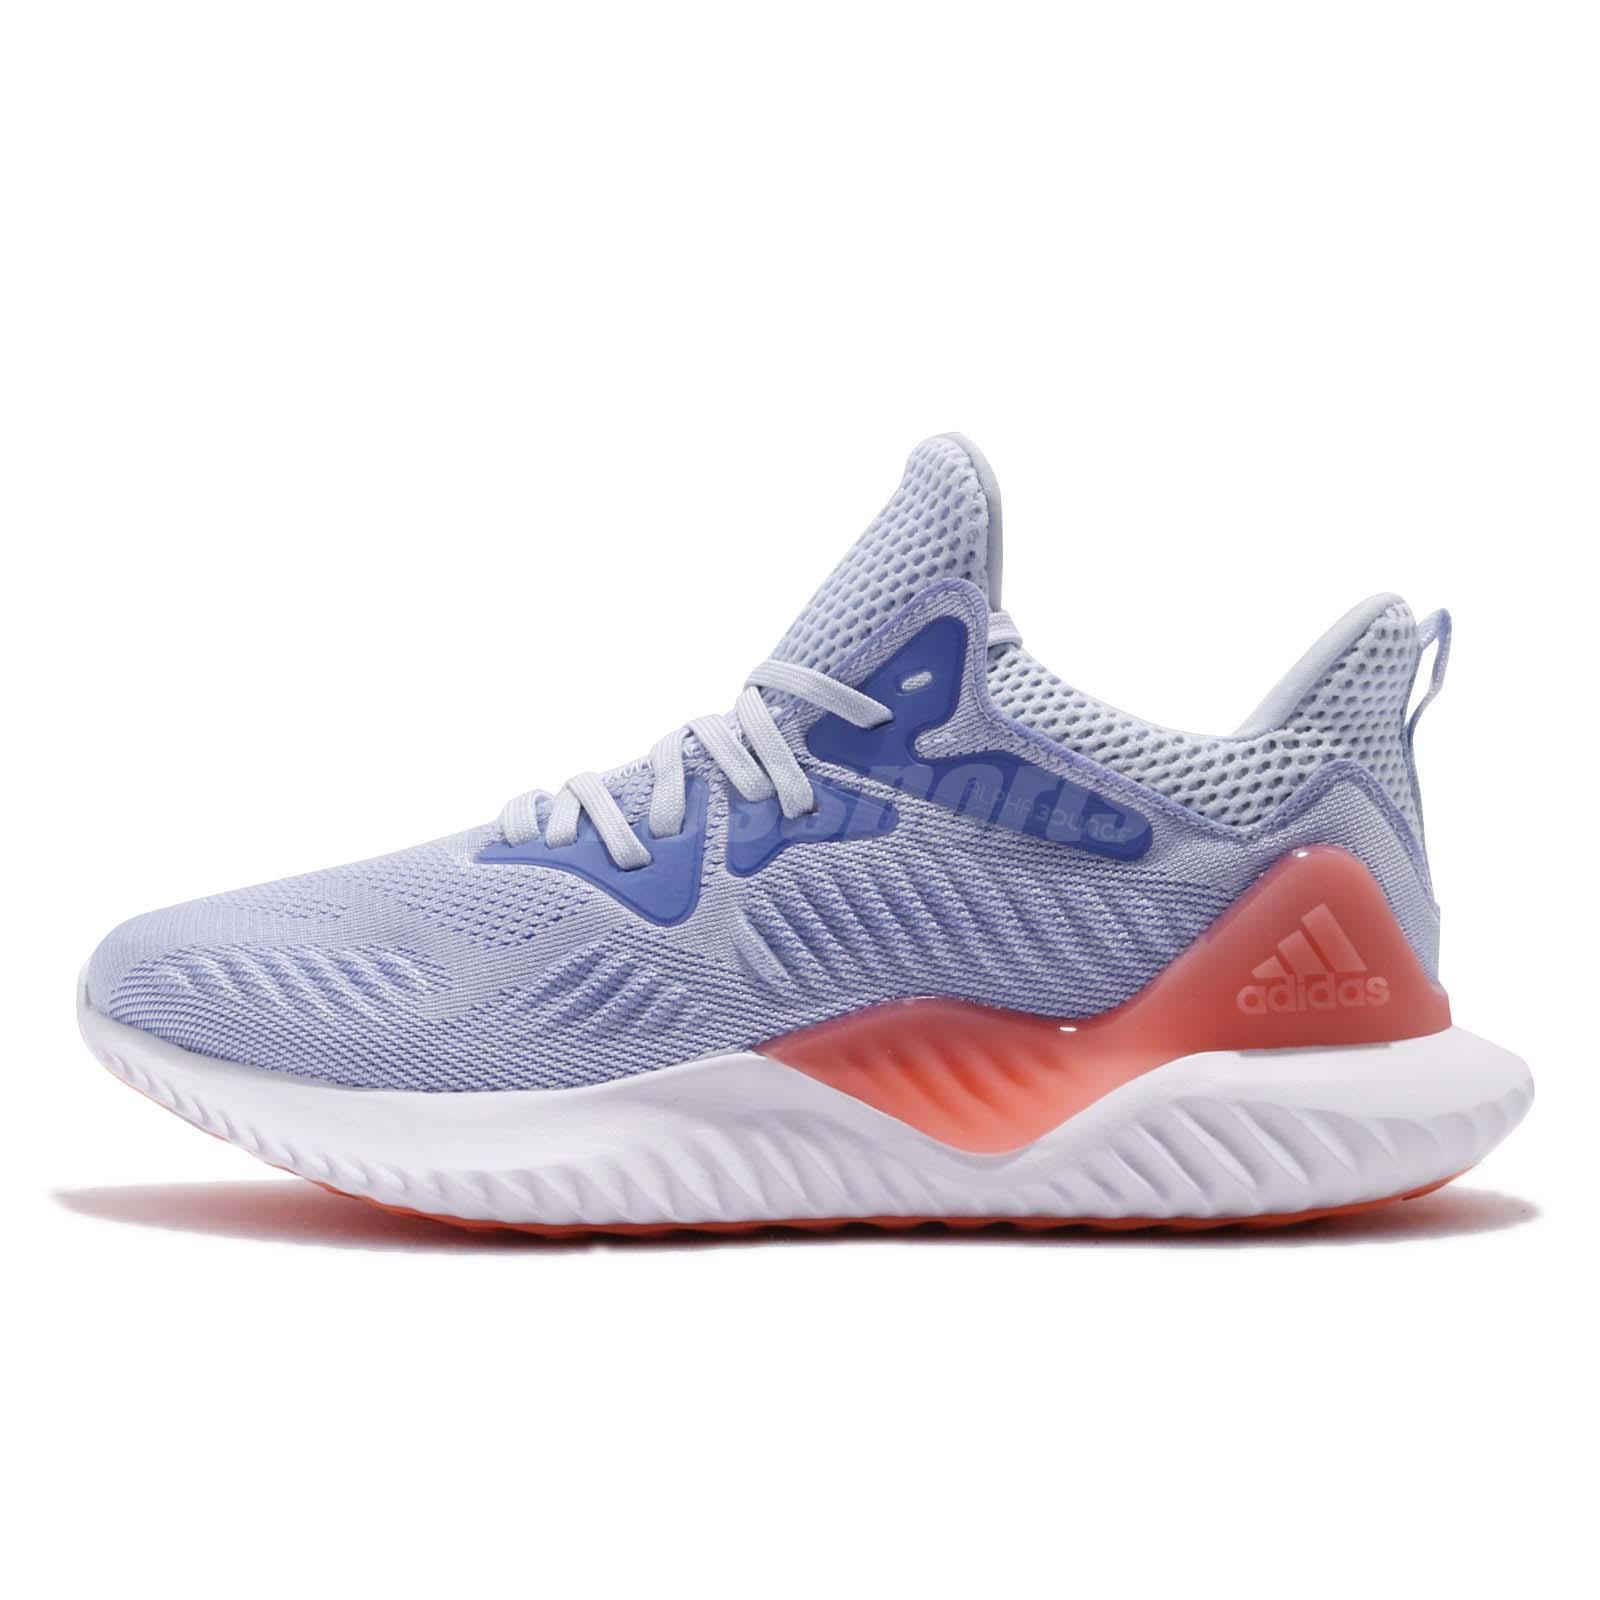 b341a6af7 adidas AlphaBOUNCE Beyond J Aero Blue Pink Kids Junior Running Shoes DB1409